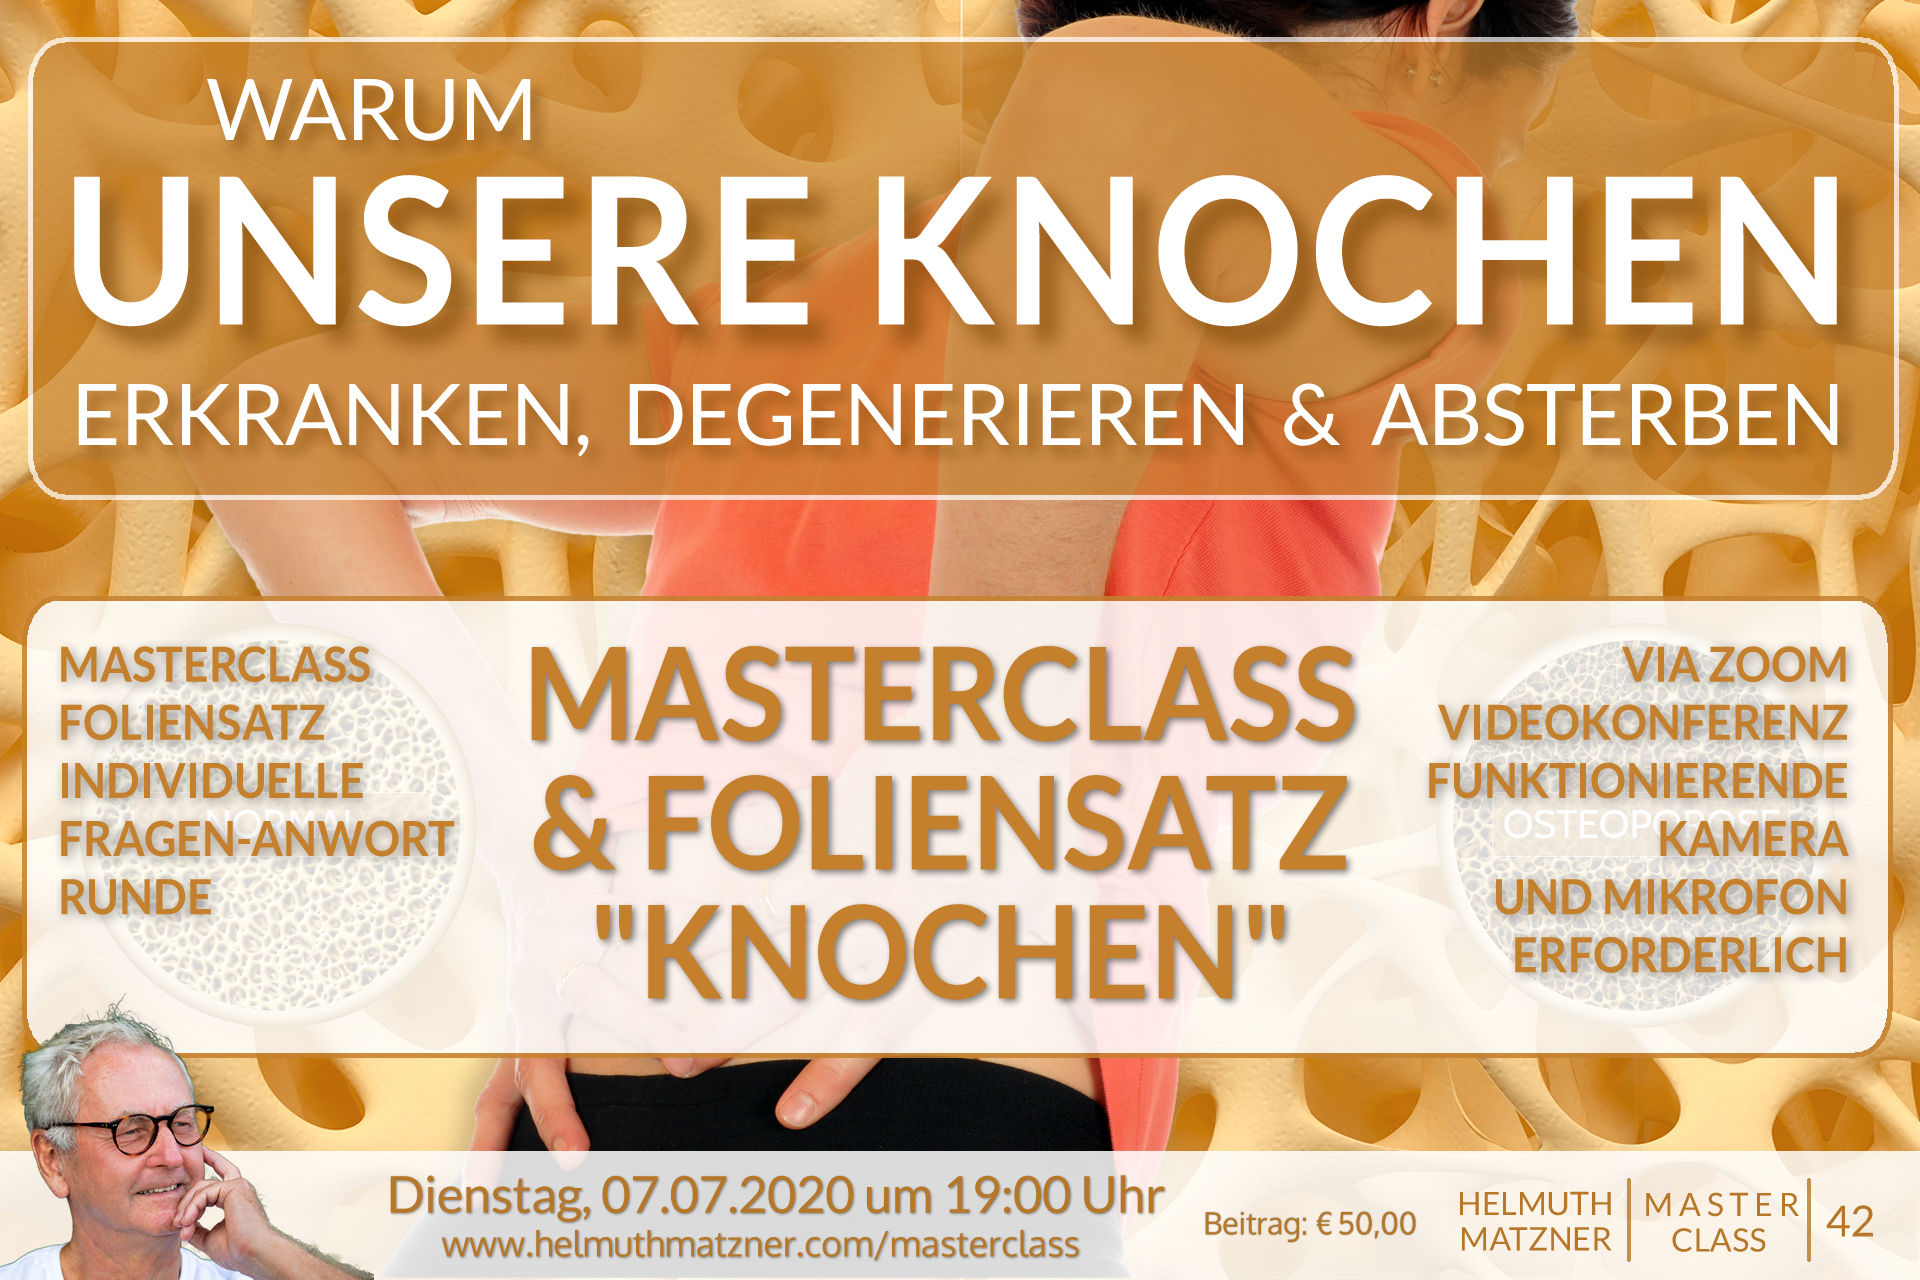 Helmuth Matzner - Masterclass 42 - Knochen - Banner v1B